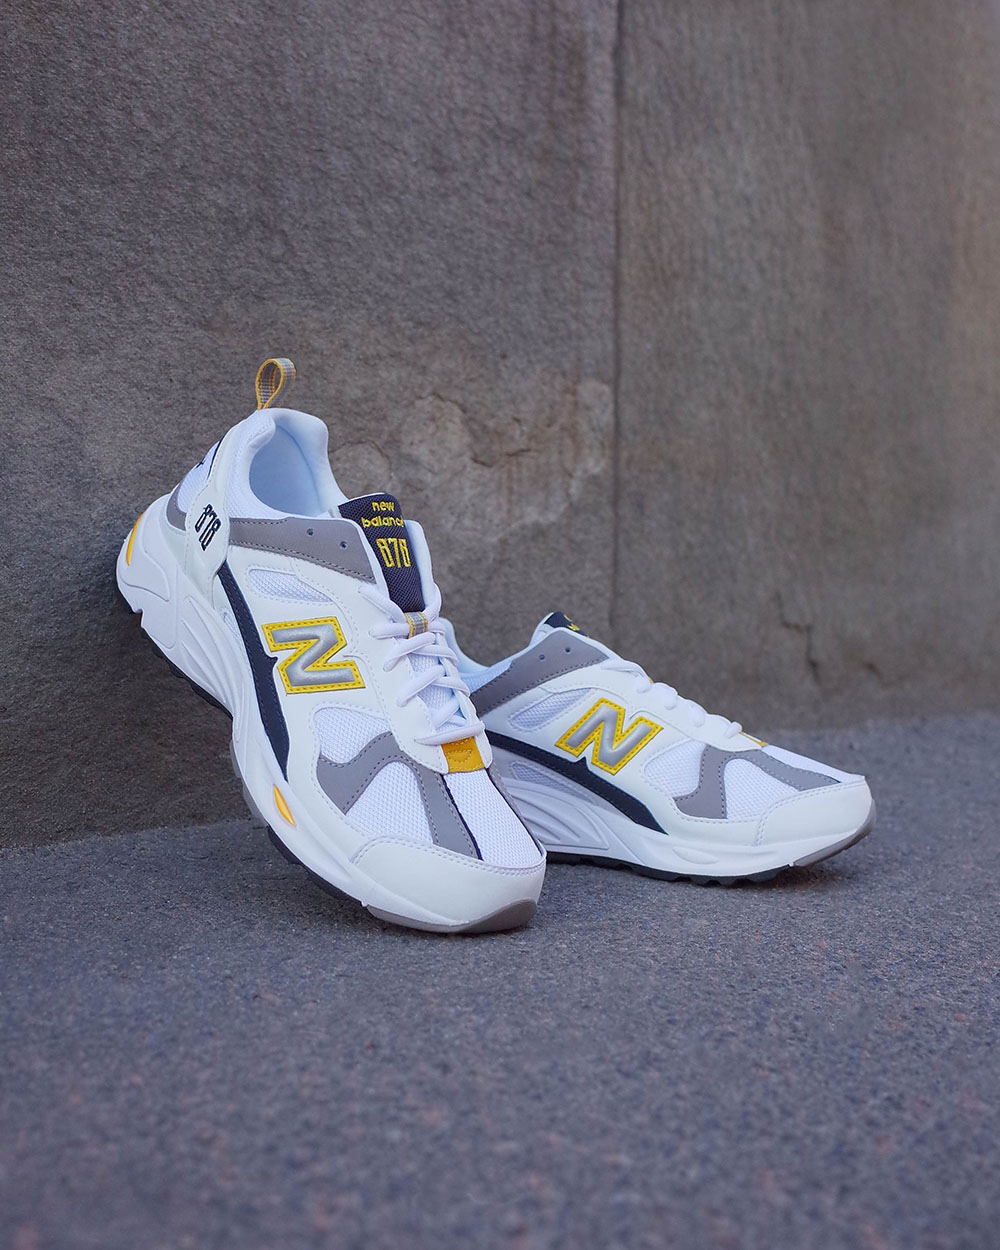 new style 1ec97 8c585 SHELTA - sneakers   street fashion since 2004